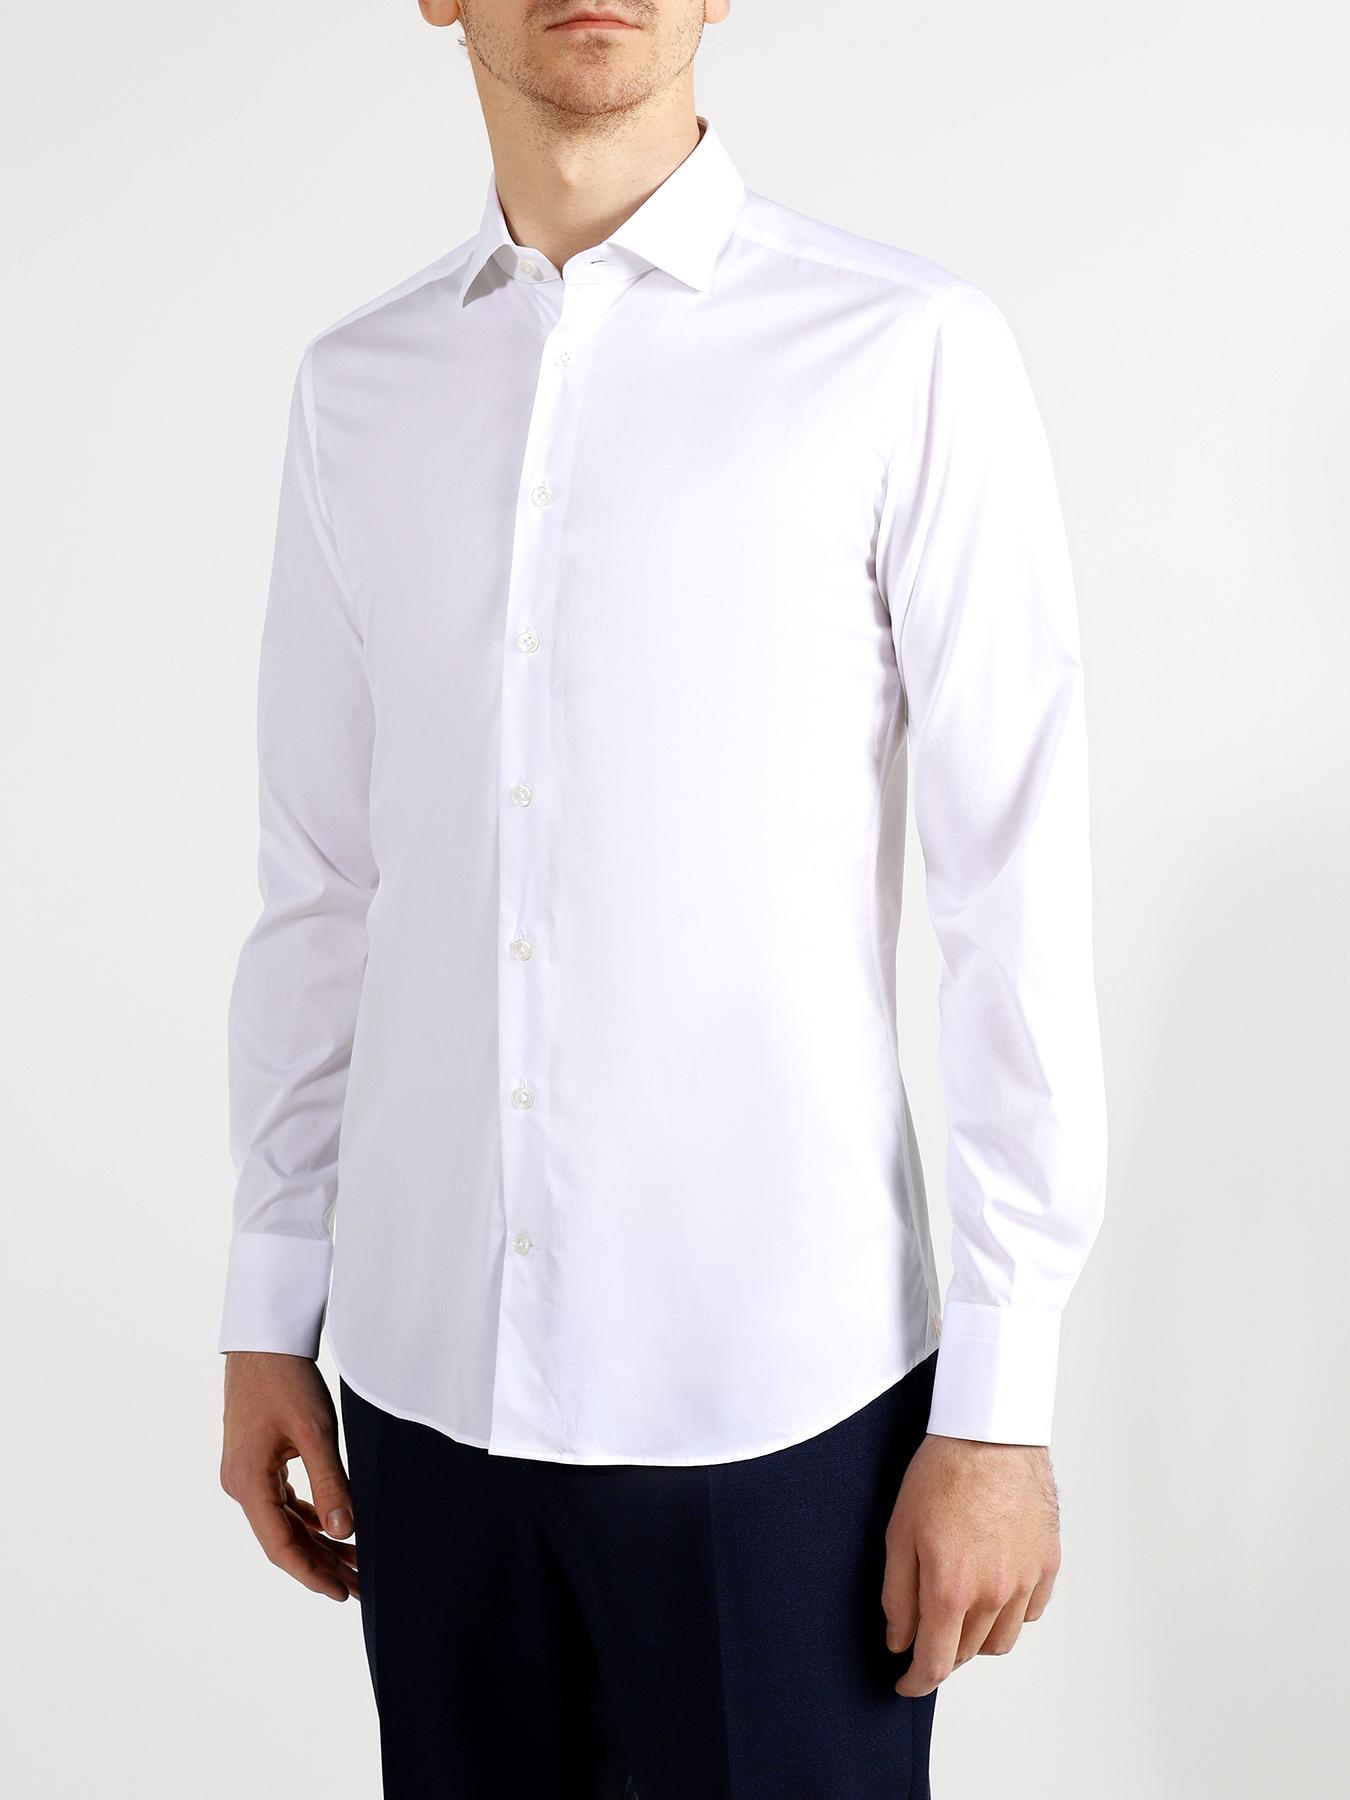 Рубашки Korpo Хлопковая рубашка с длинным рукавом